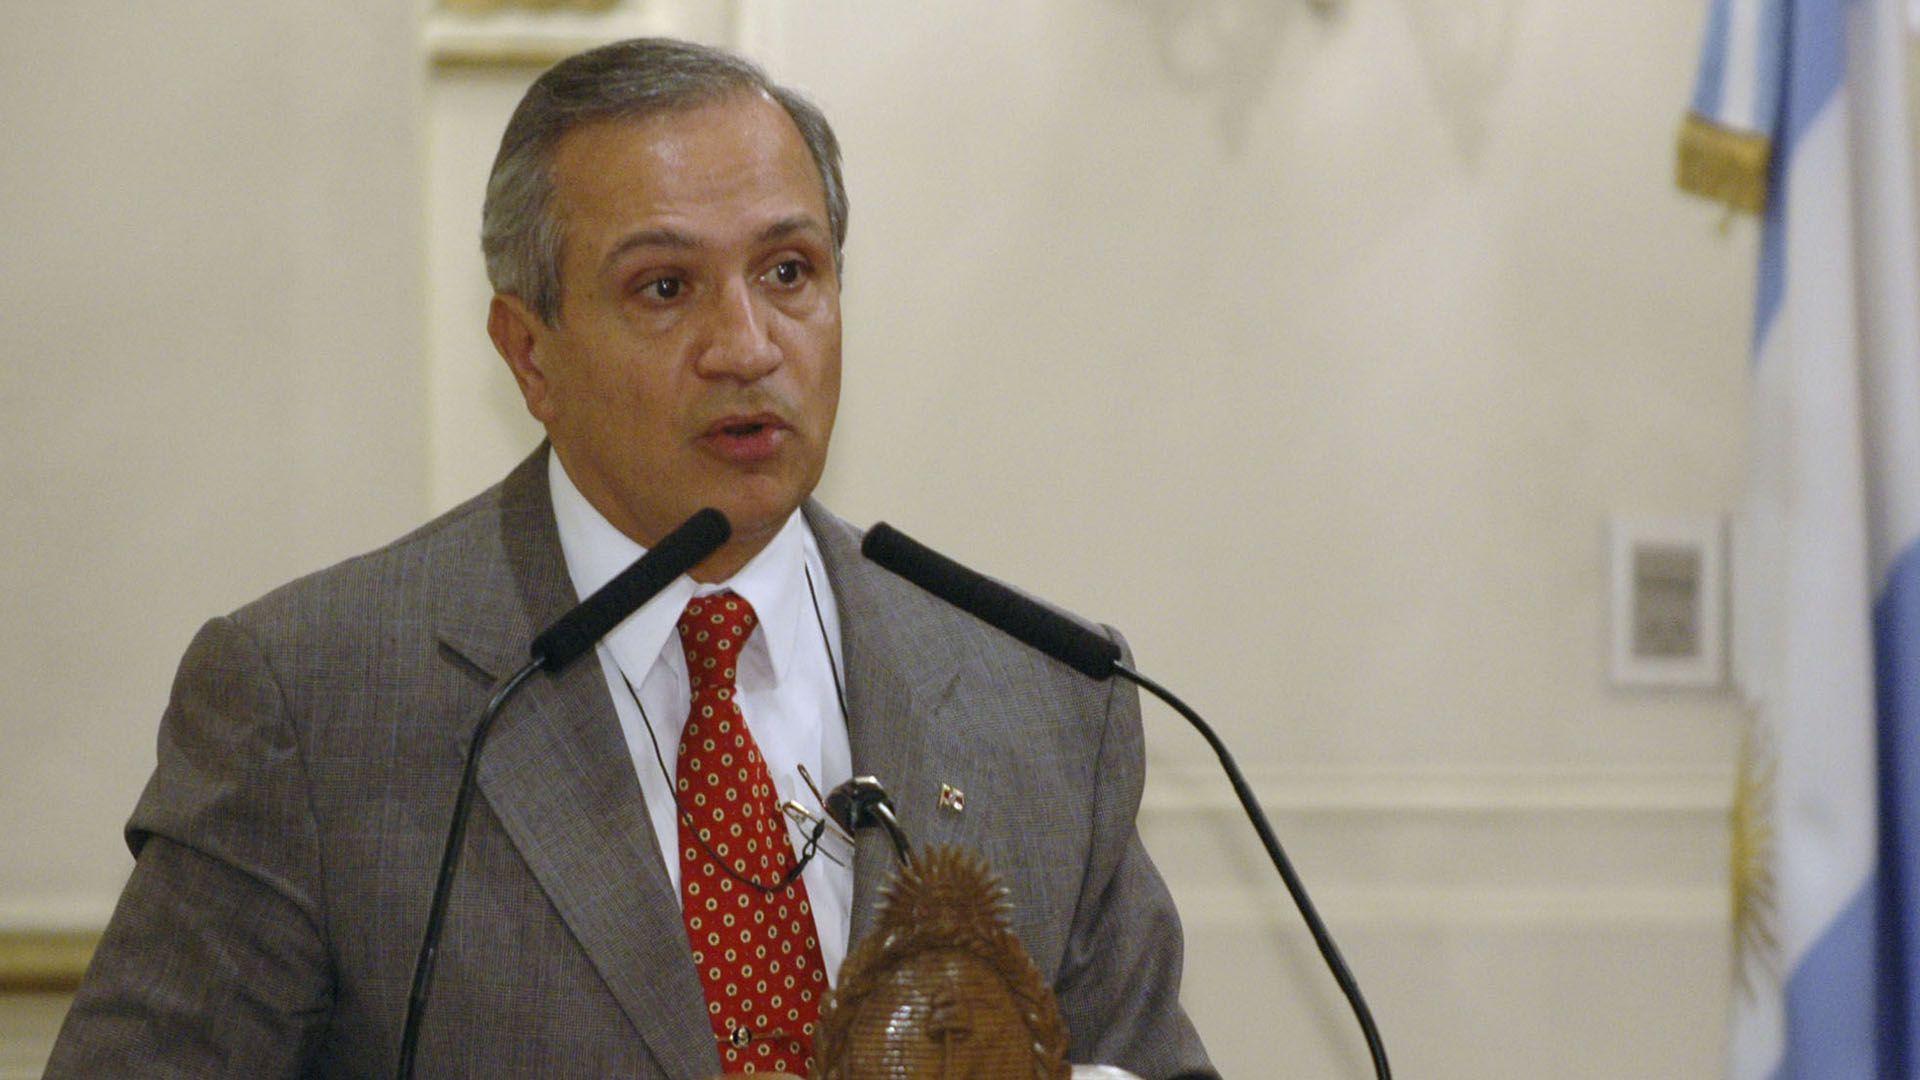 El senador por Santa Juan Carlos Romero del PJ (NA)